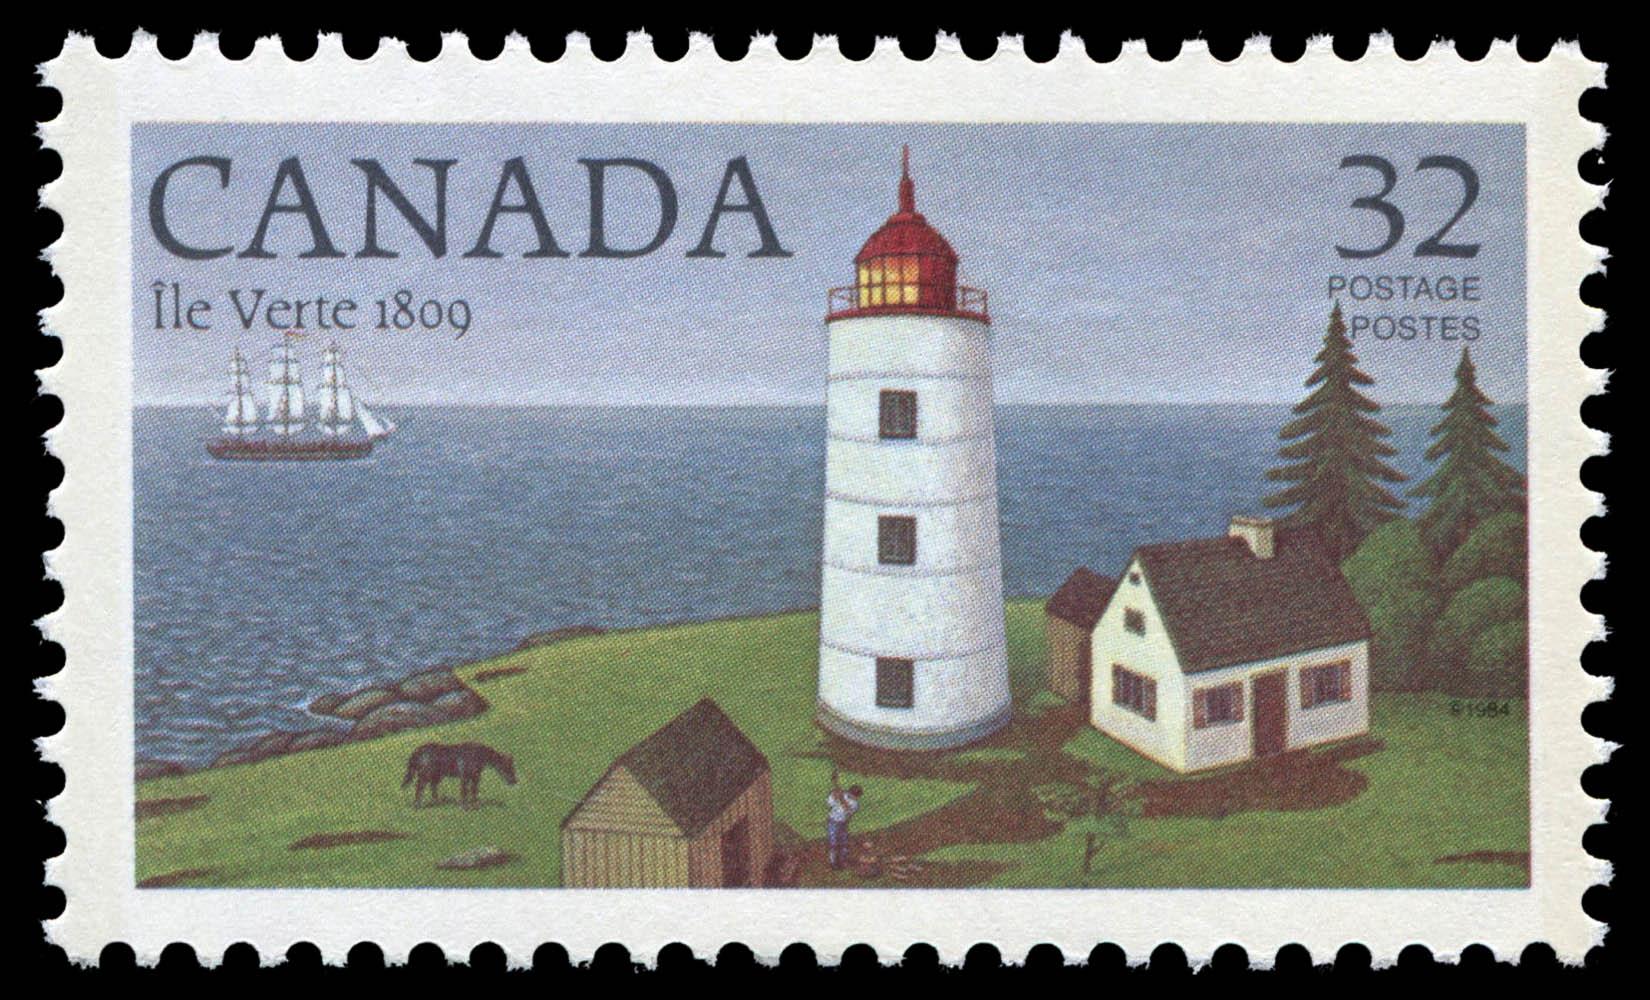 Ile Verte, 1809 Canada Postage Stamp | Lighthouses of Canada